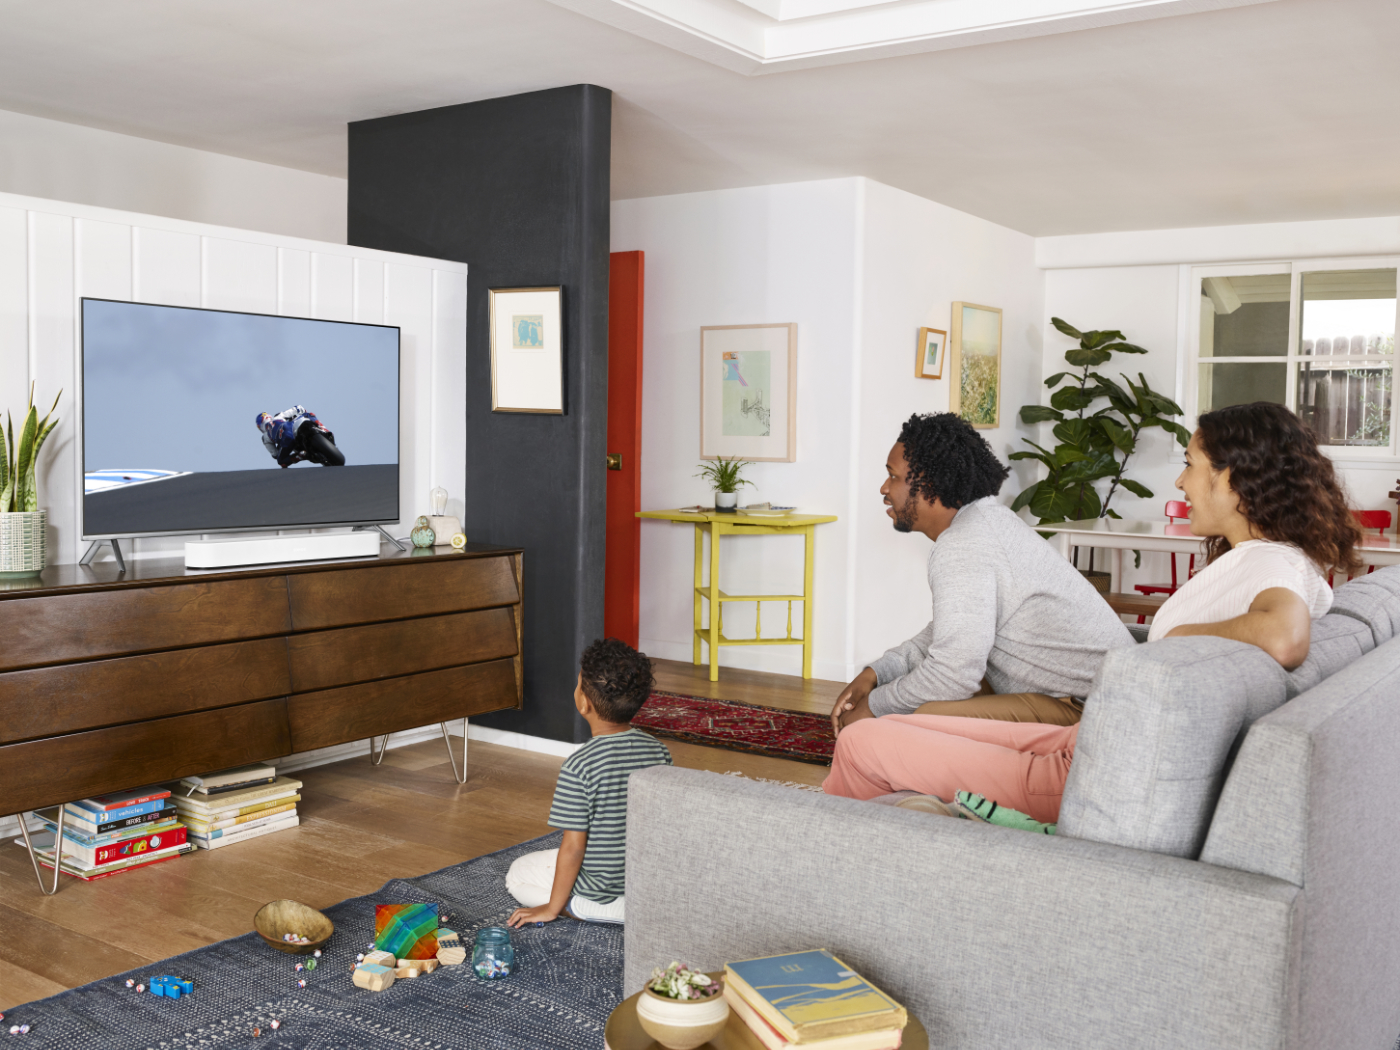 Beam_White-Lifestyle-At_Home_With_Sonos-Large_Living_Room-MotoGp-Q1FY21_MST-MST_JPEG_fid118974